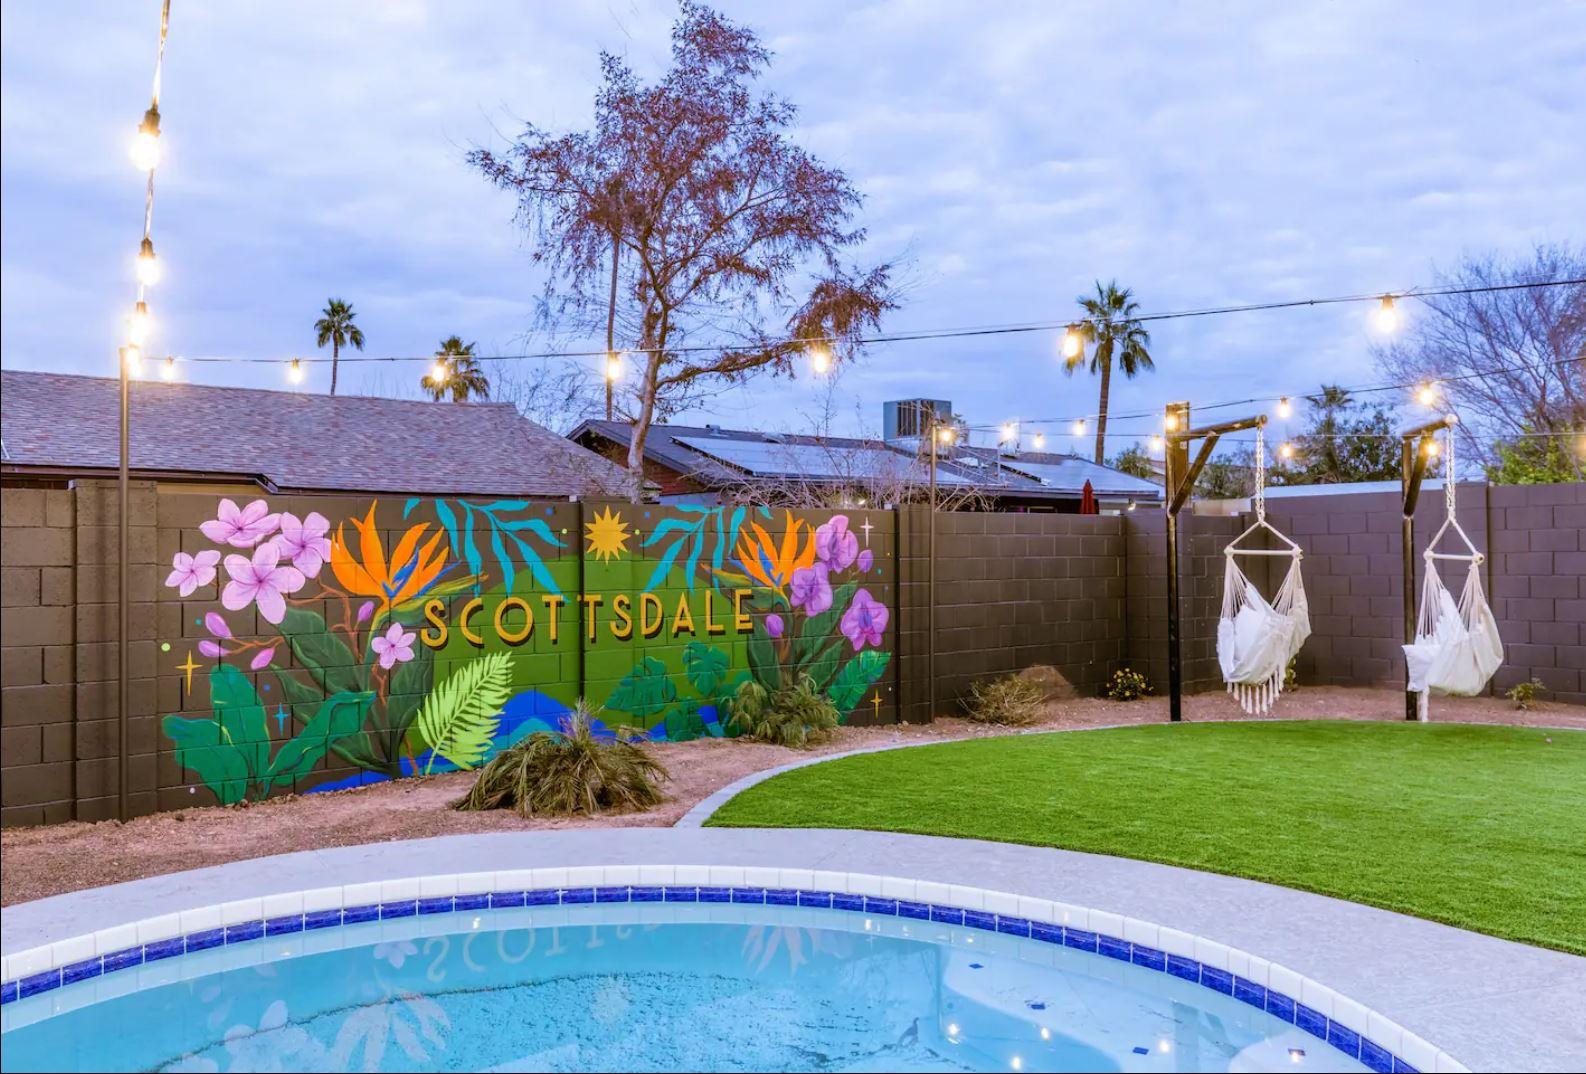 Tropical Oasis airbn mural